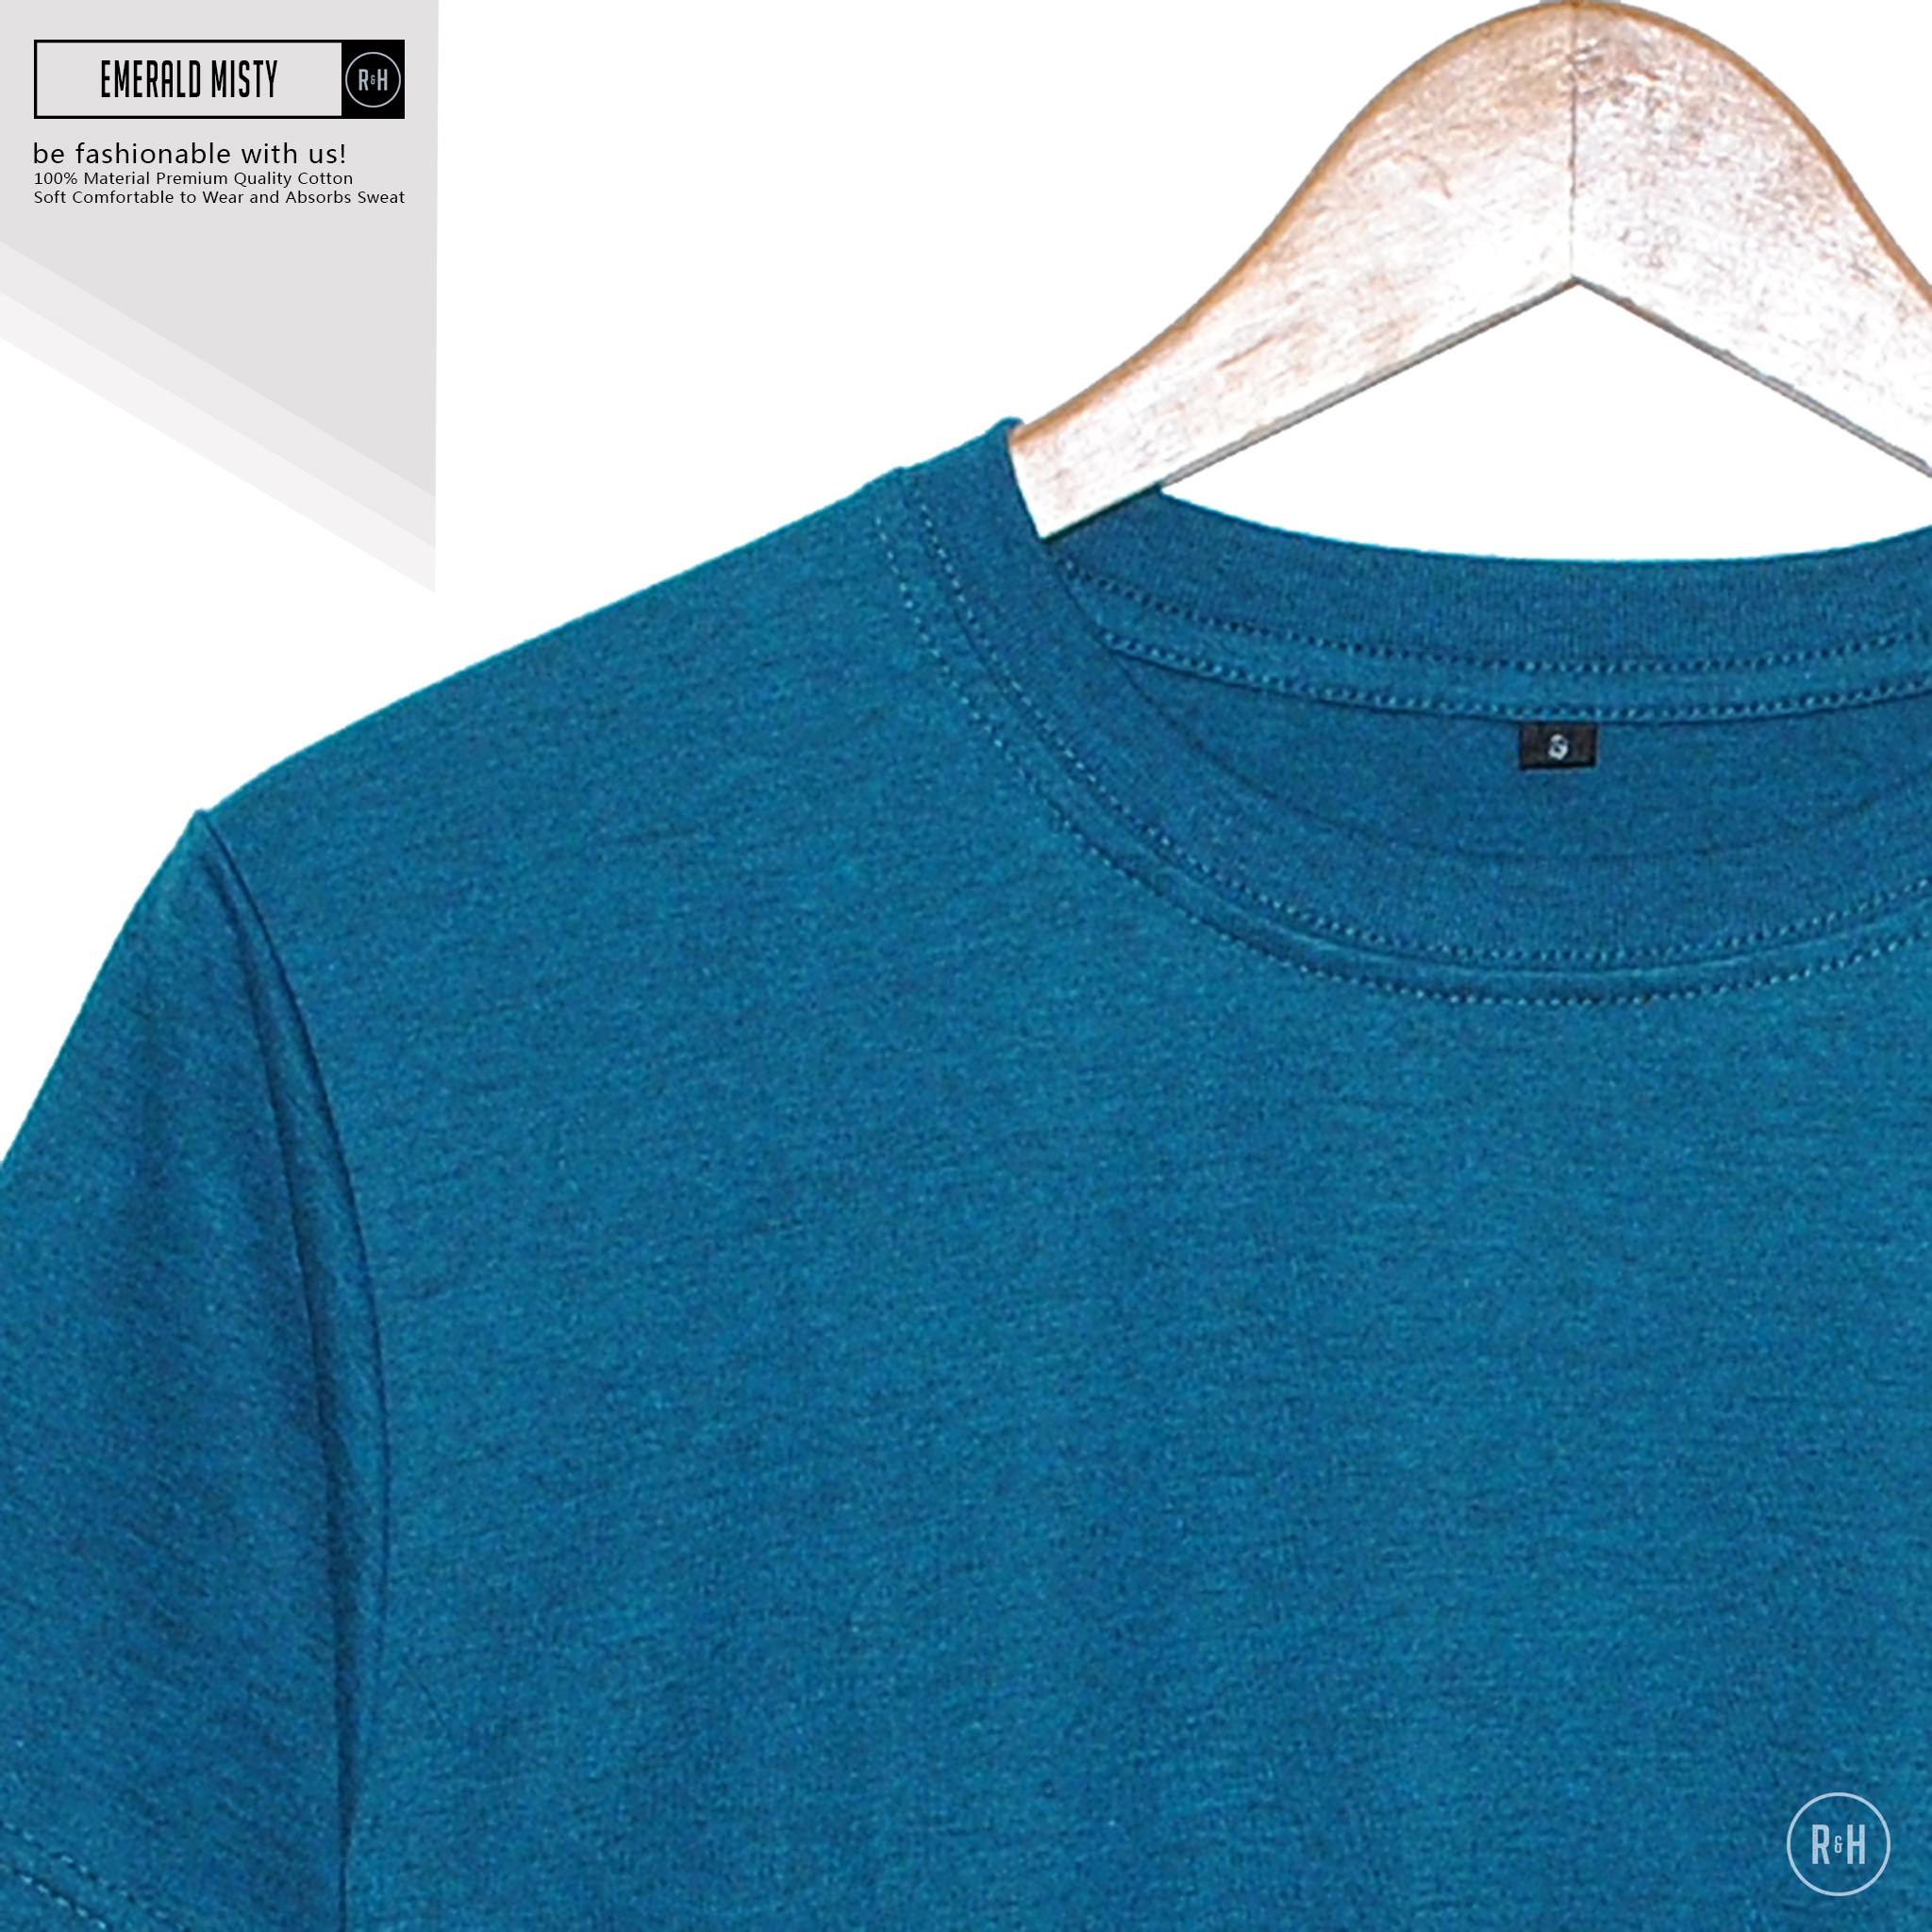 Rh Fashion Shop Line Kaos Polos Navy Misty Emerald O Neck Unisex